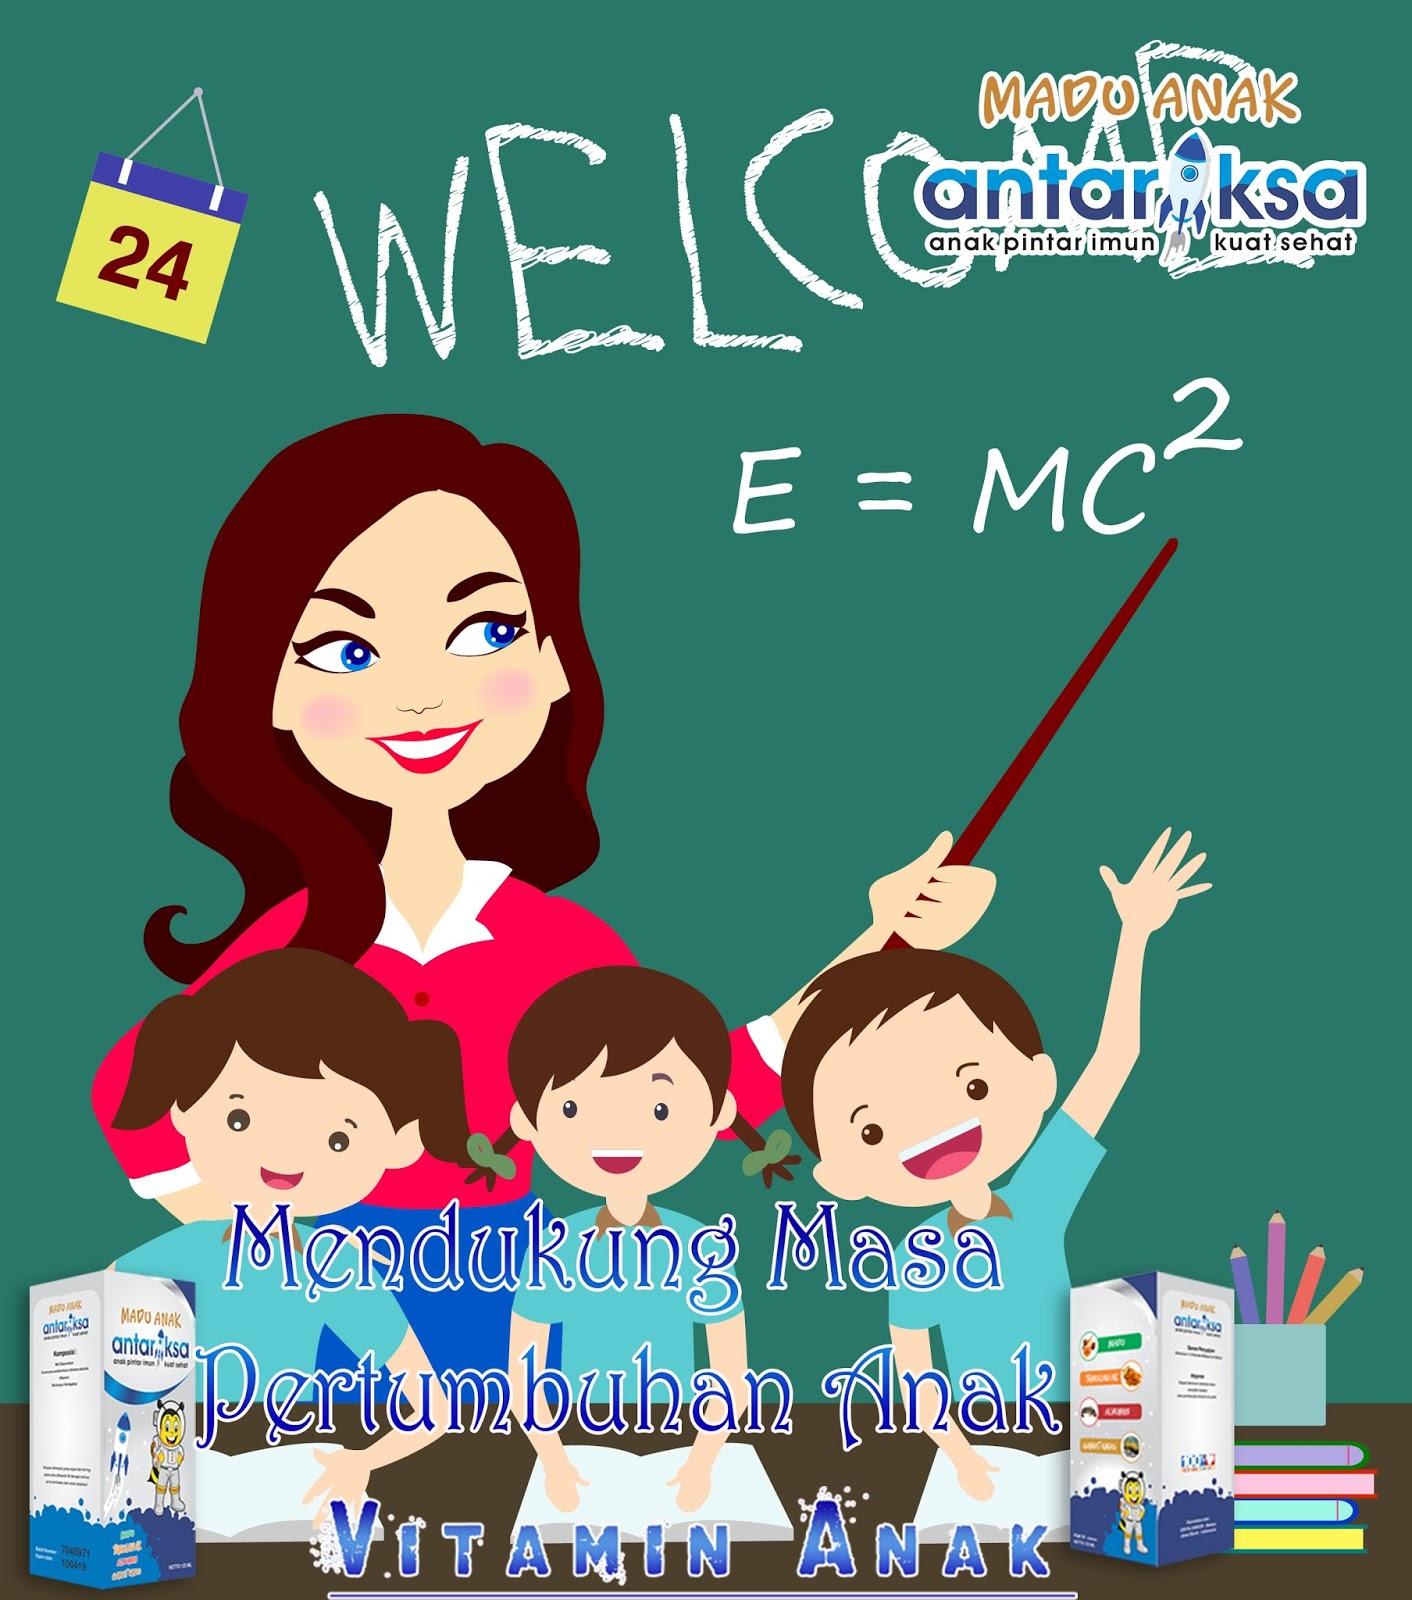 Vitamin Anak Untuk Masa Pertumbuhan